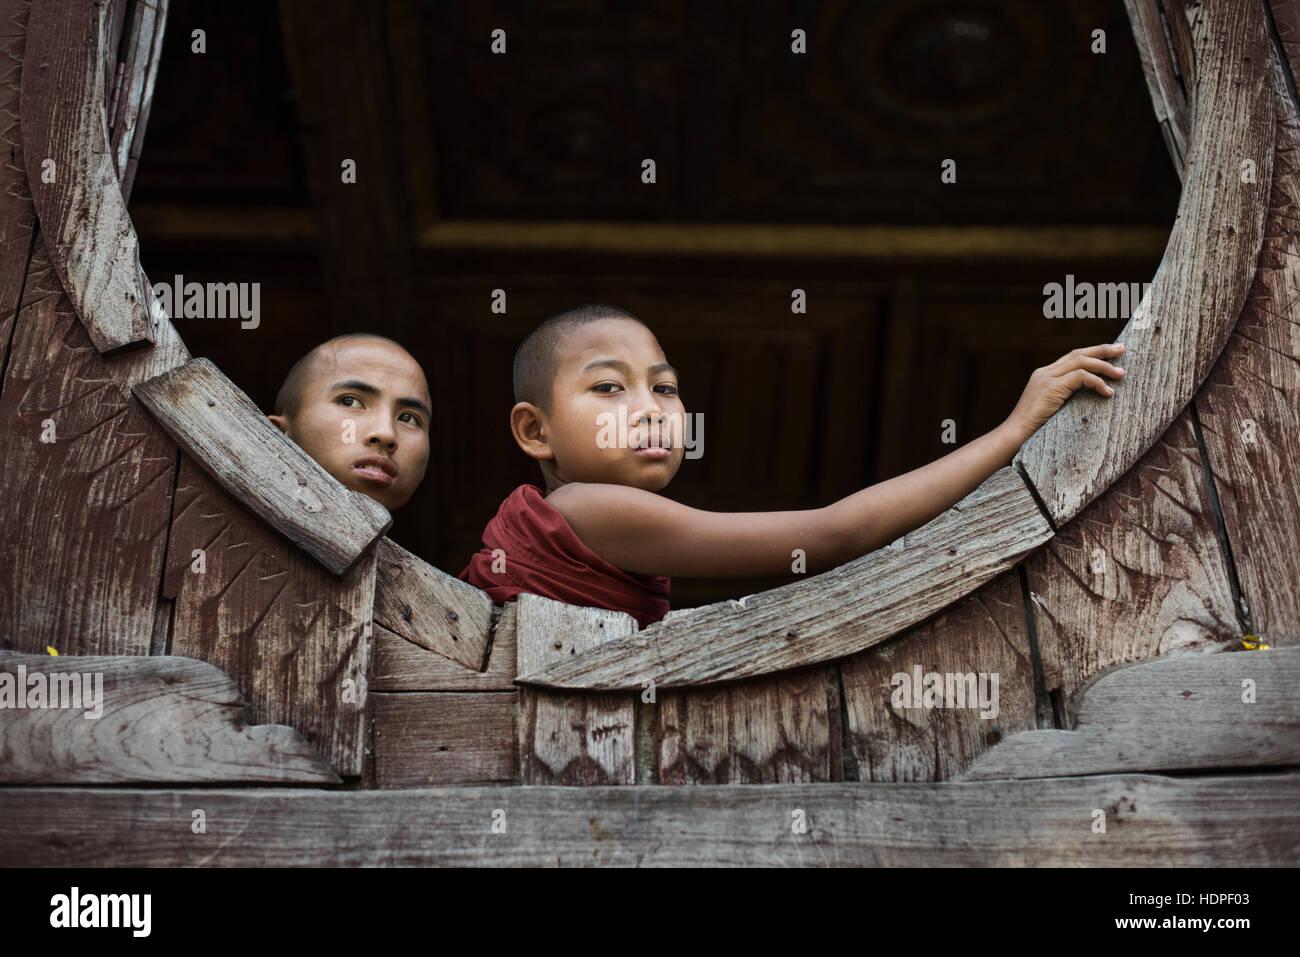 Il debuttante i monaci buddisti a Shwe Yan Pyay del monastero di legno in Nyaungshwe, Myanmar. Immagini Stock